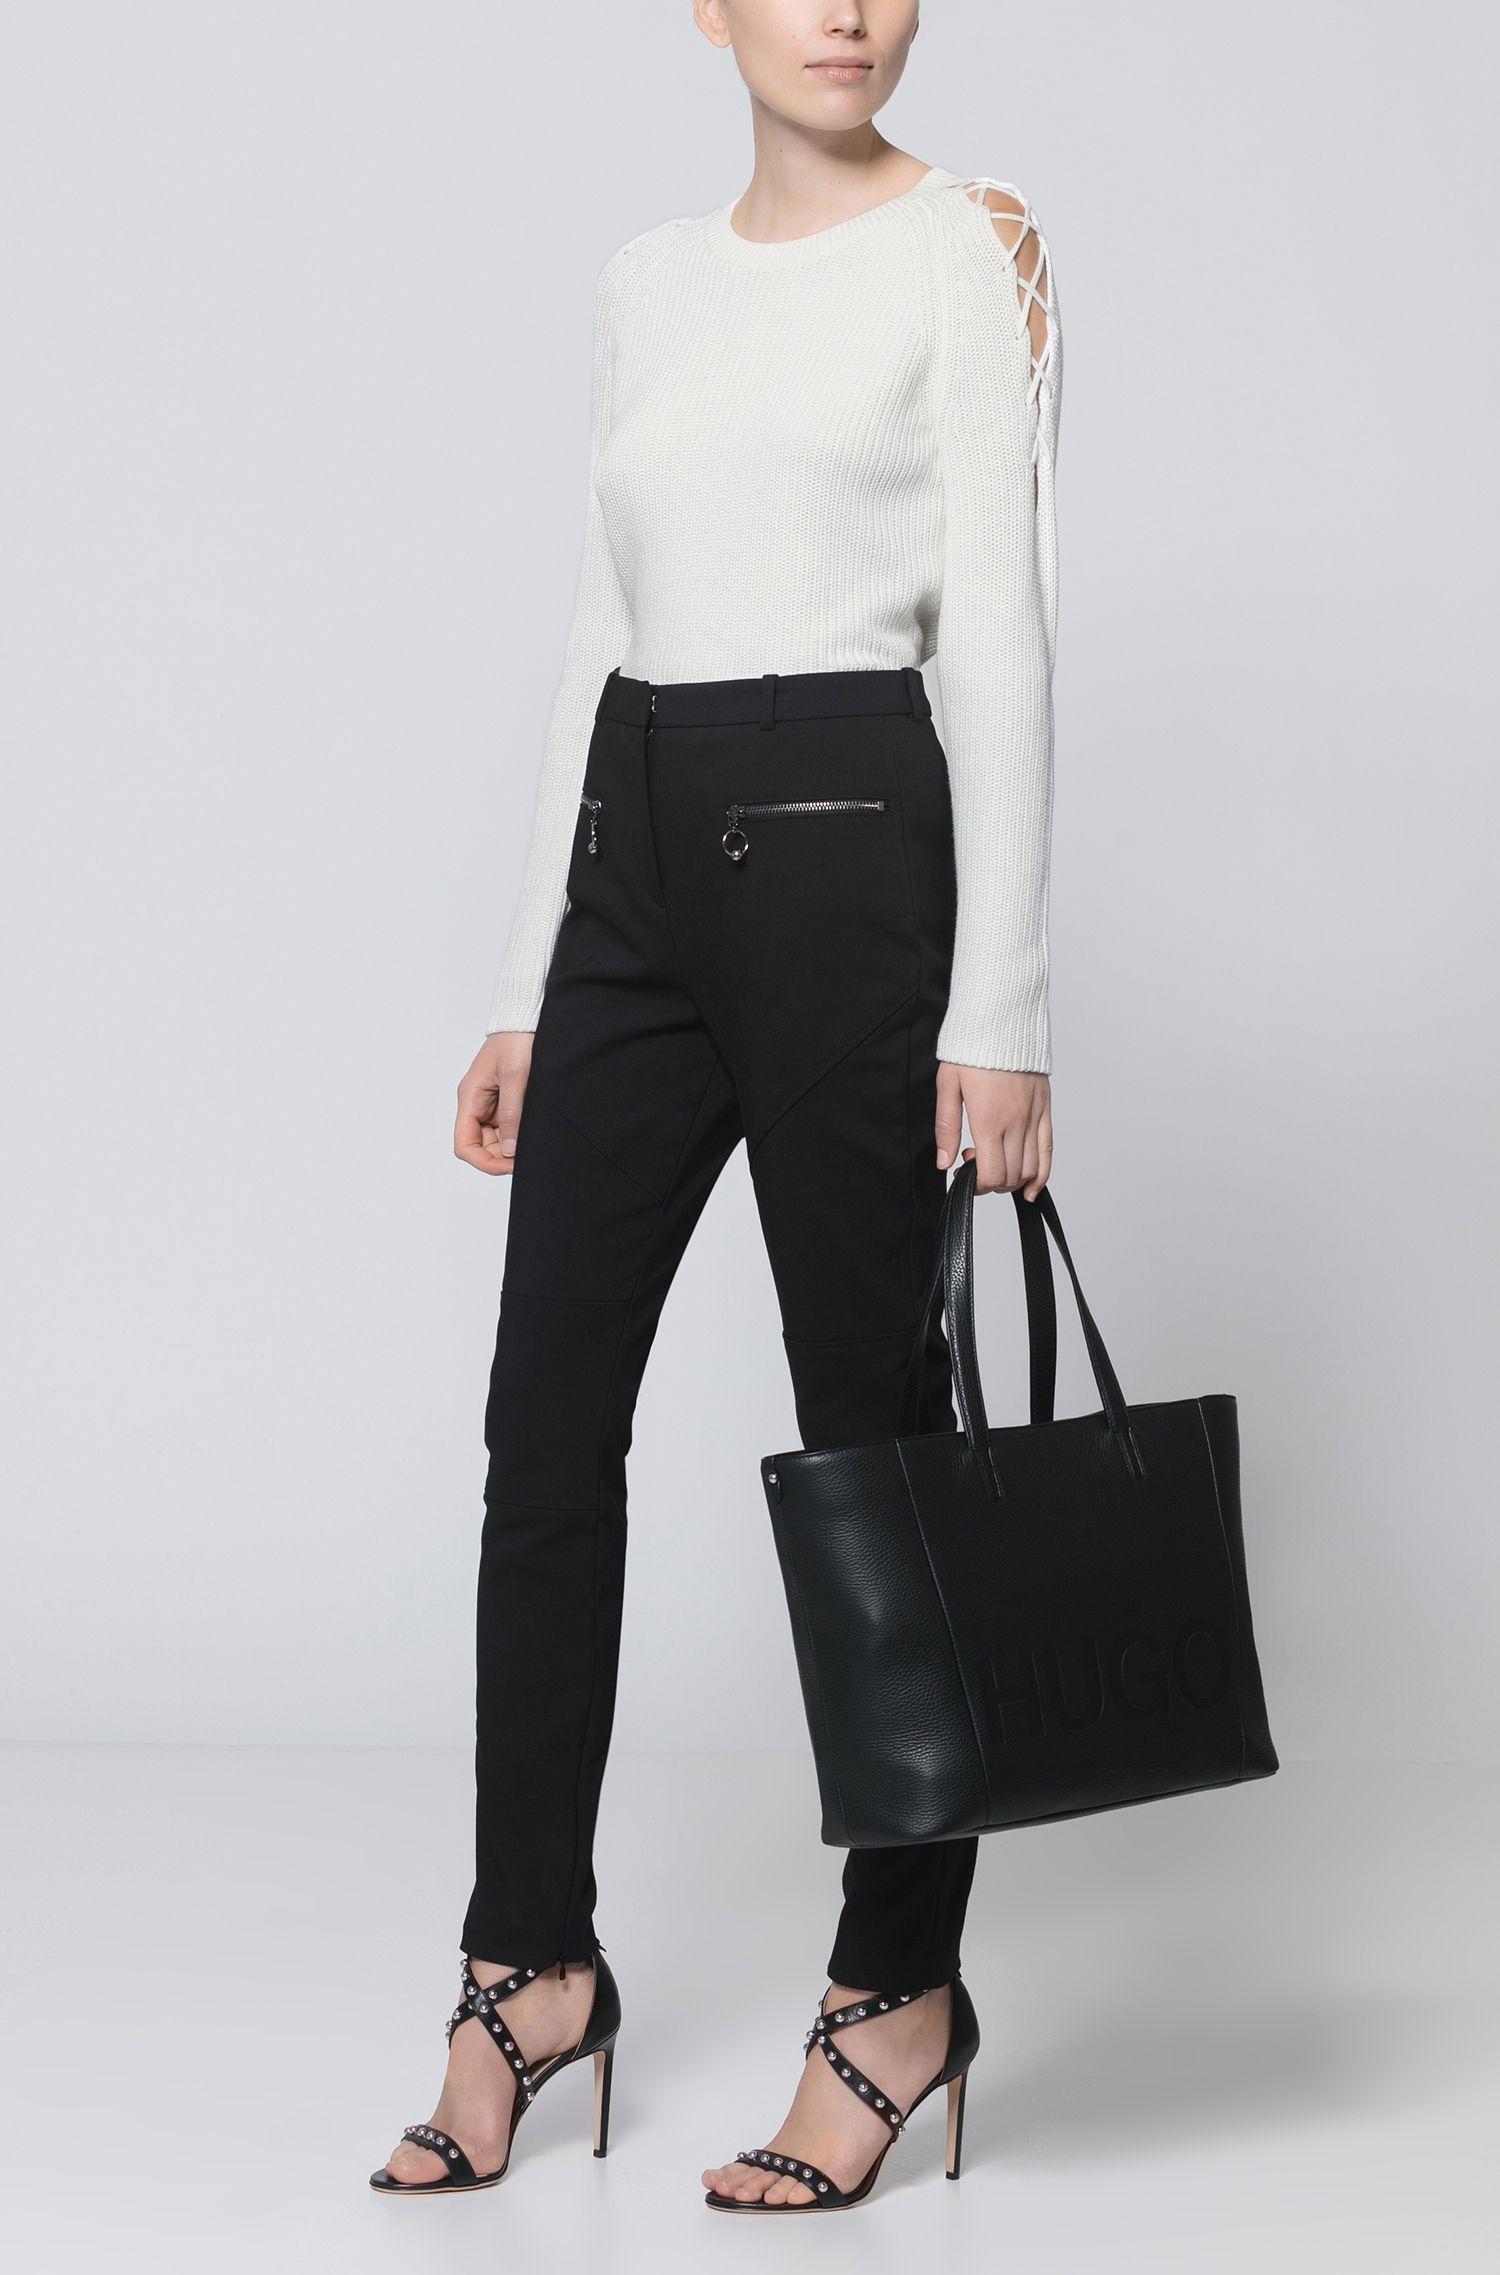 Embossed Leather Shopper Tote | Mayfair Shopper